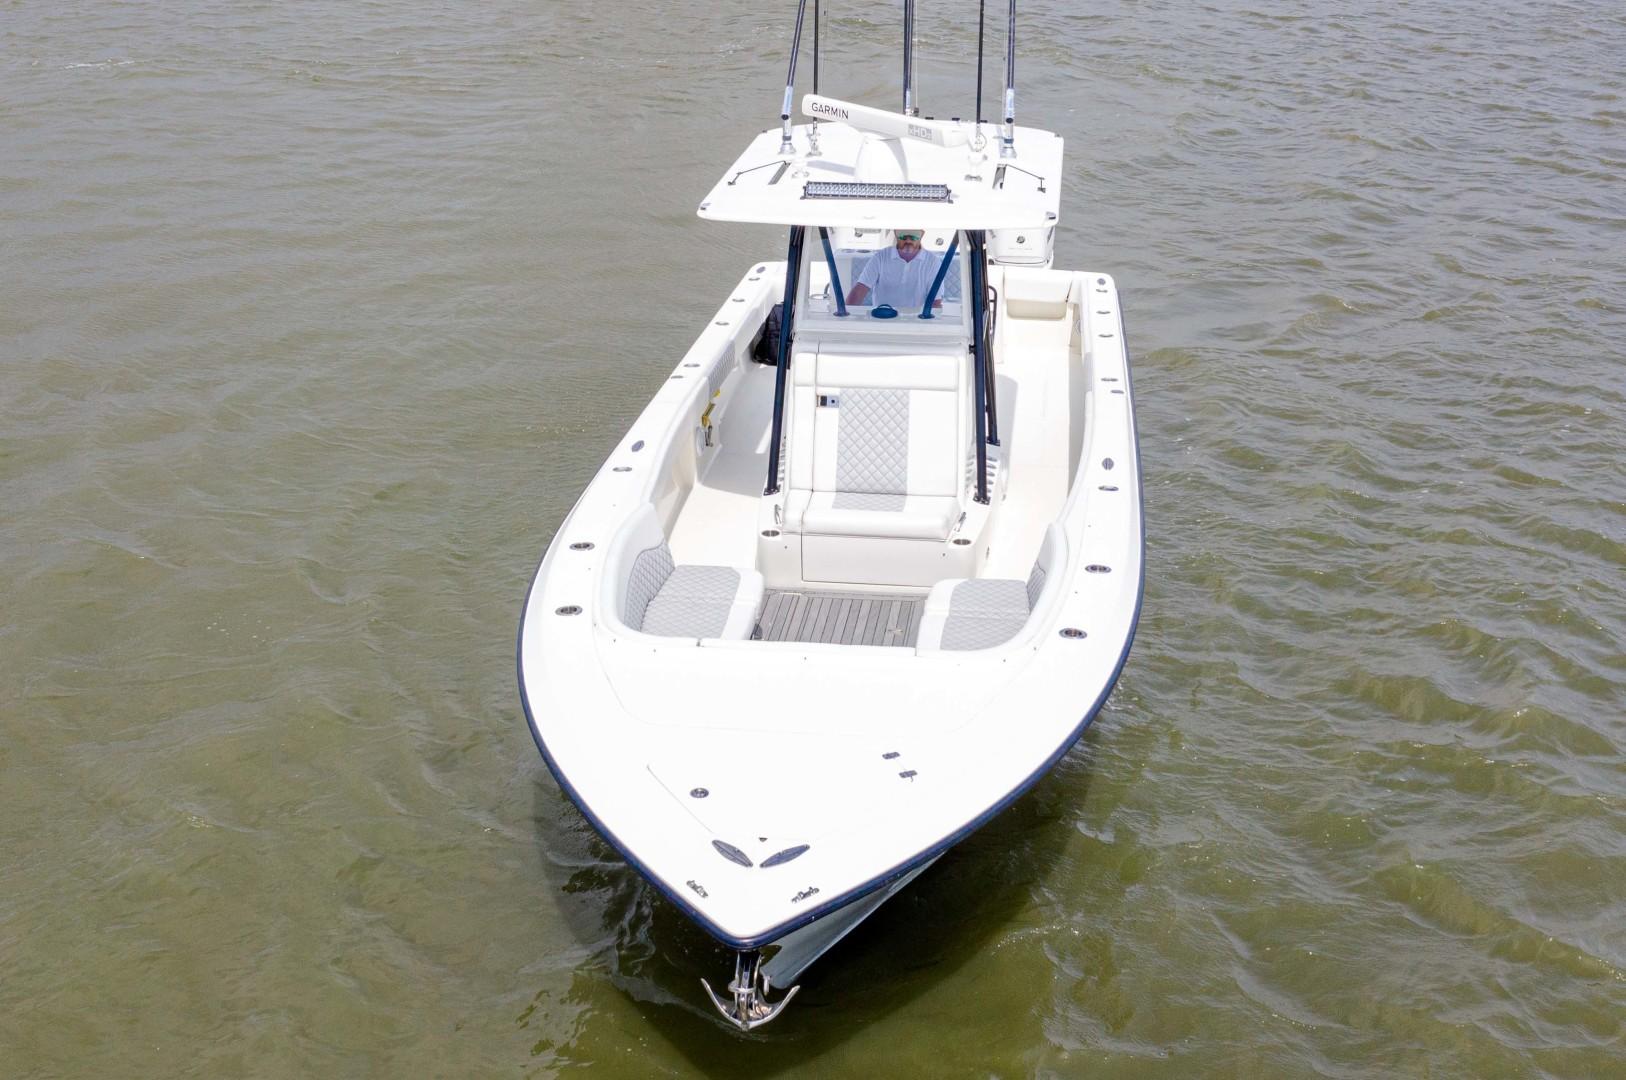 SeaVee-340 B Center Console 2014-Riff Raff Mount Pleasant-South Carolina-United States-Bow Profile-1509706 | Thumbnail